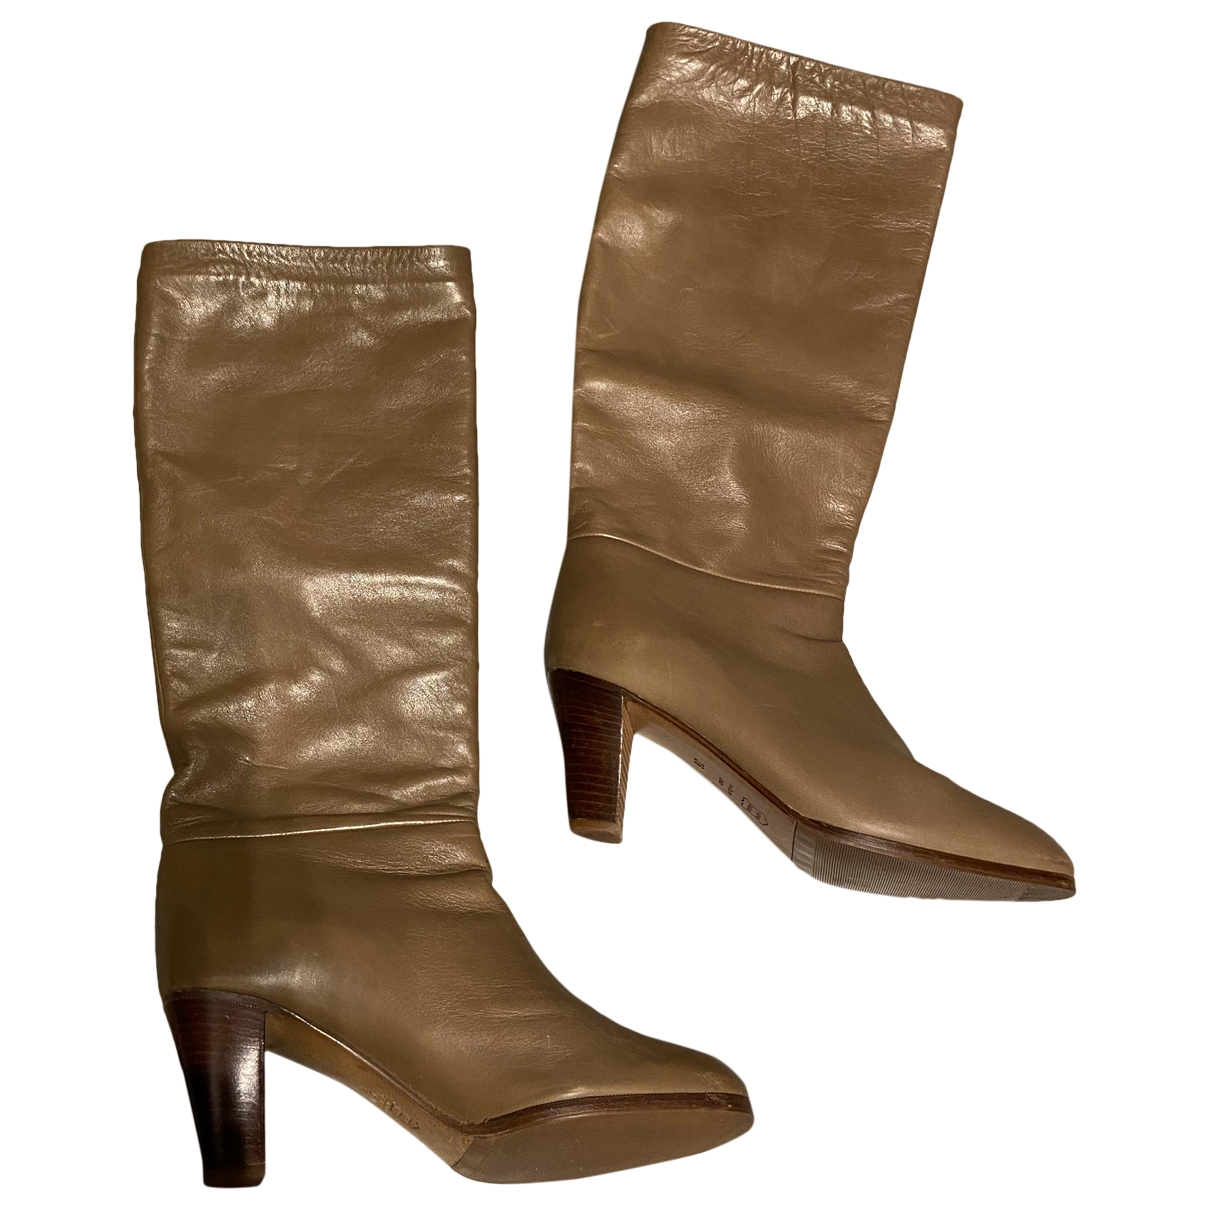 Barneys New York - Bottes   pour femme en cuir - beige